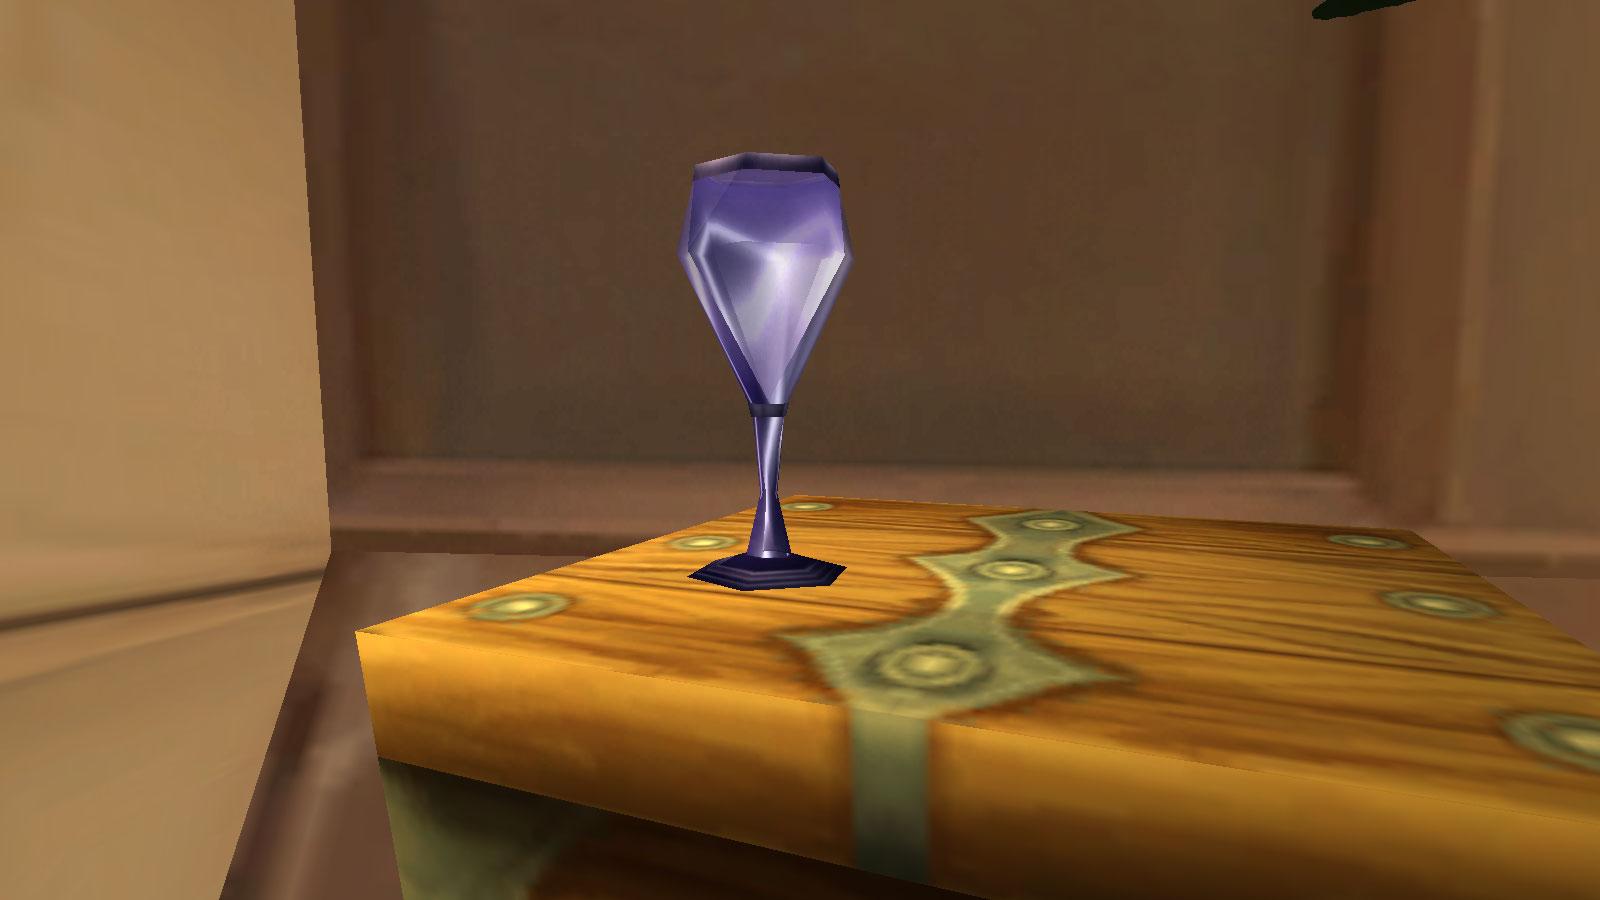 Everfull Wine Glass